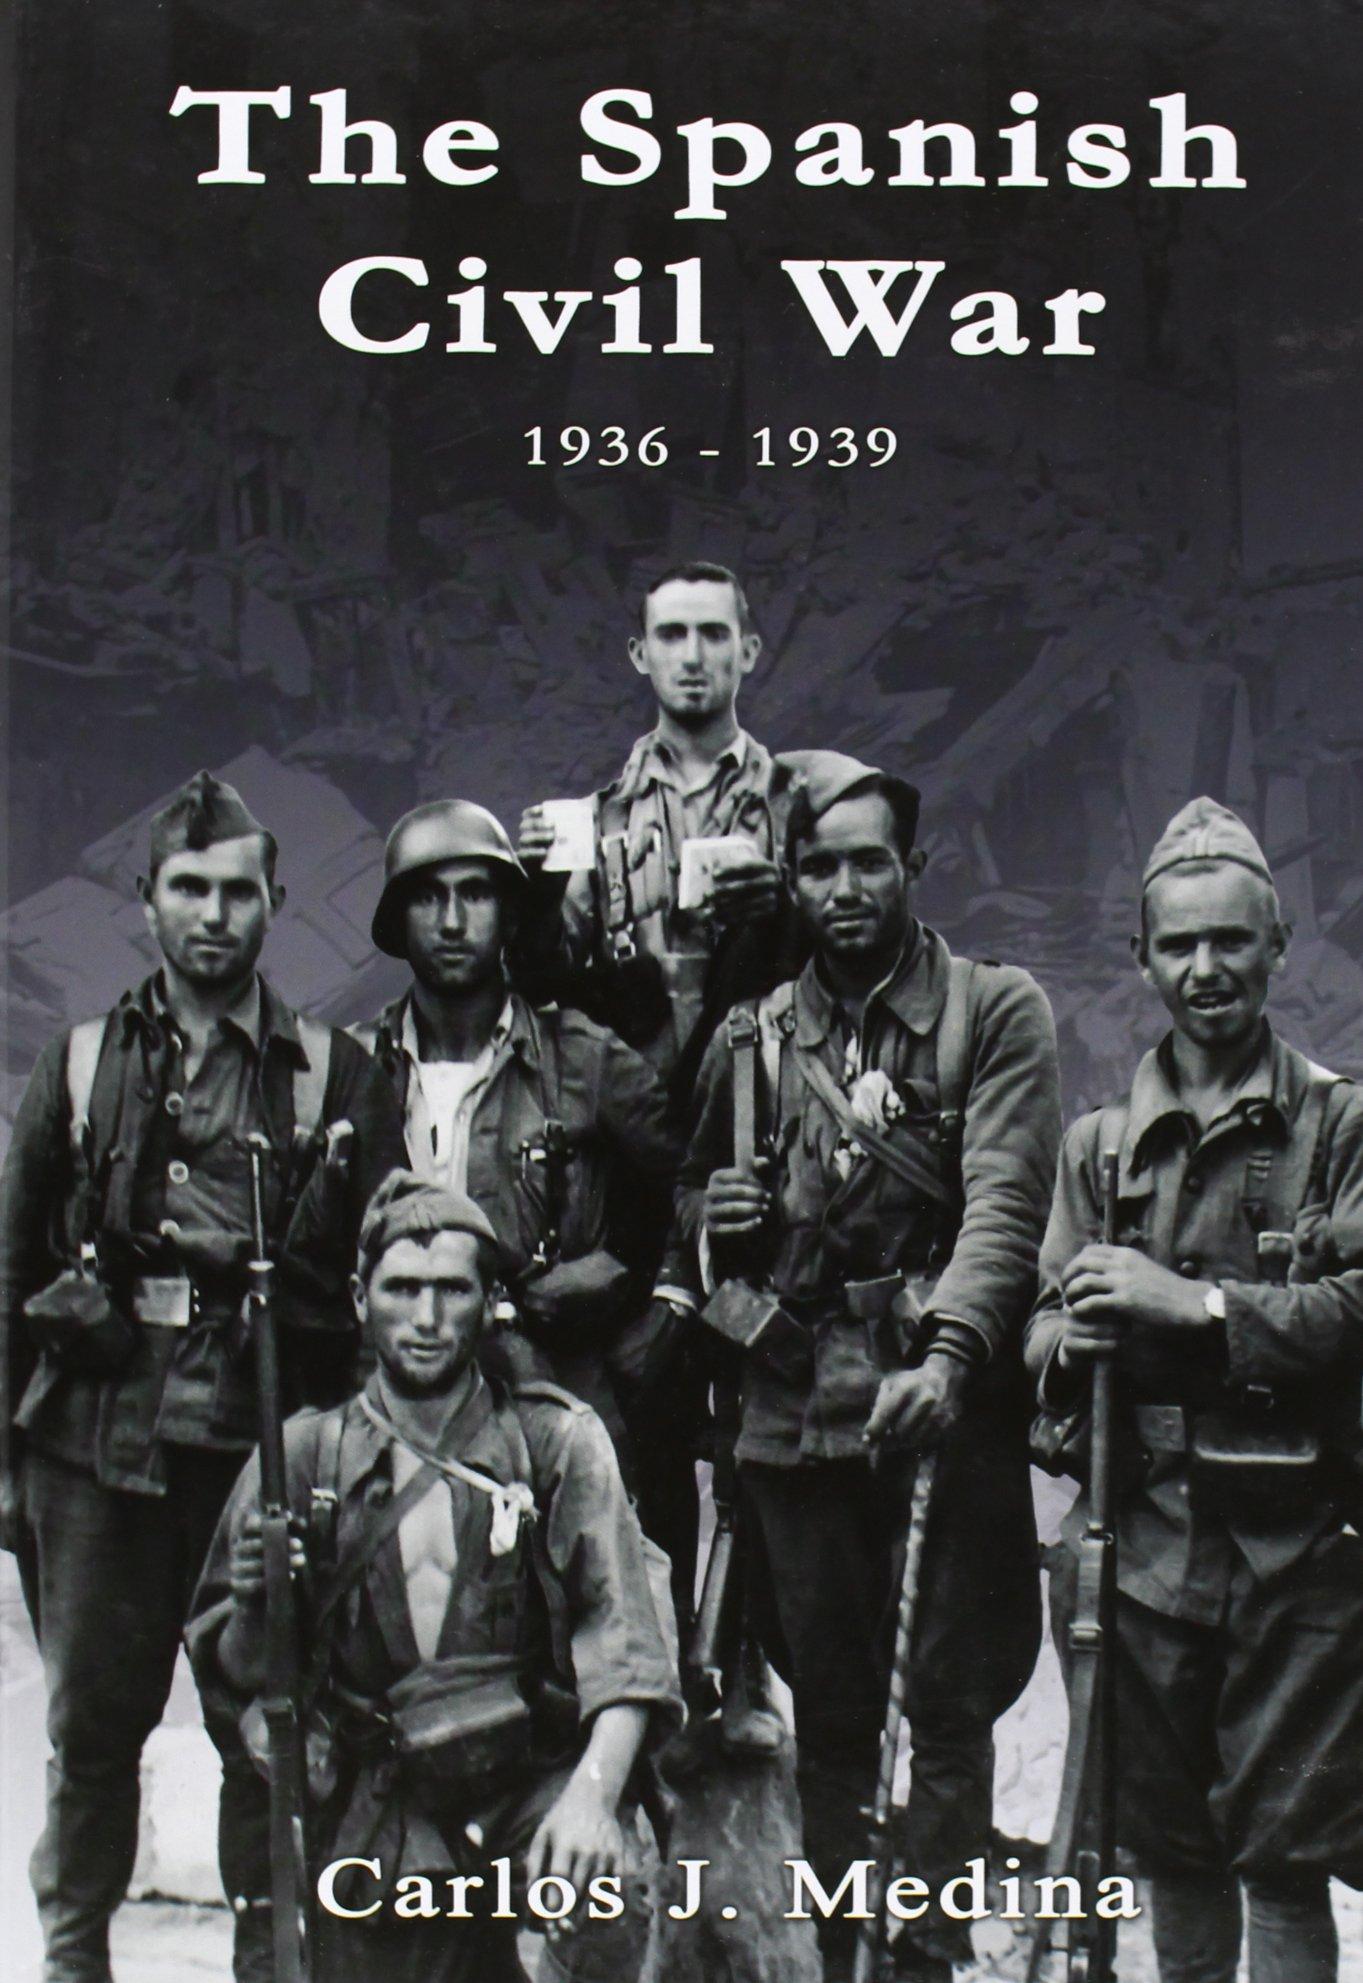 Download Spanish Civil War 1936-1939 PDF